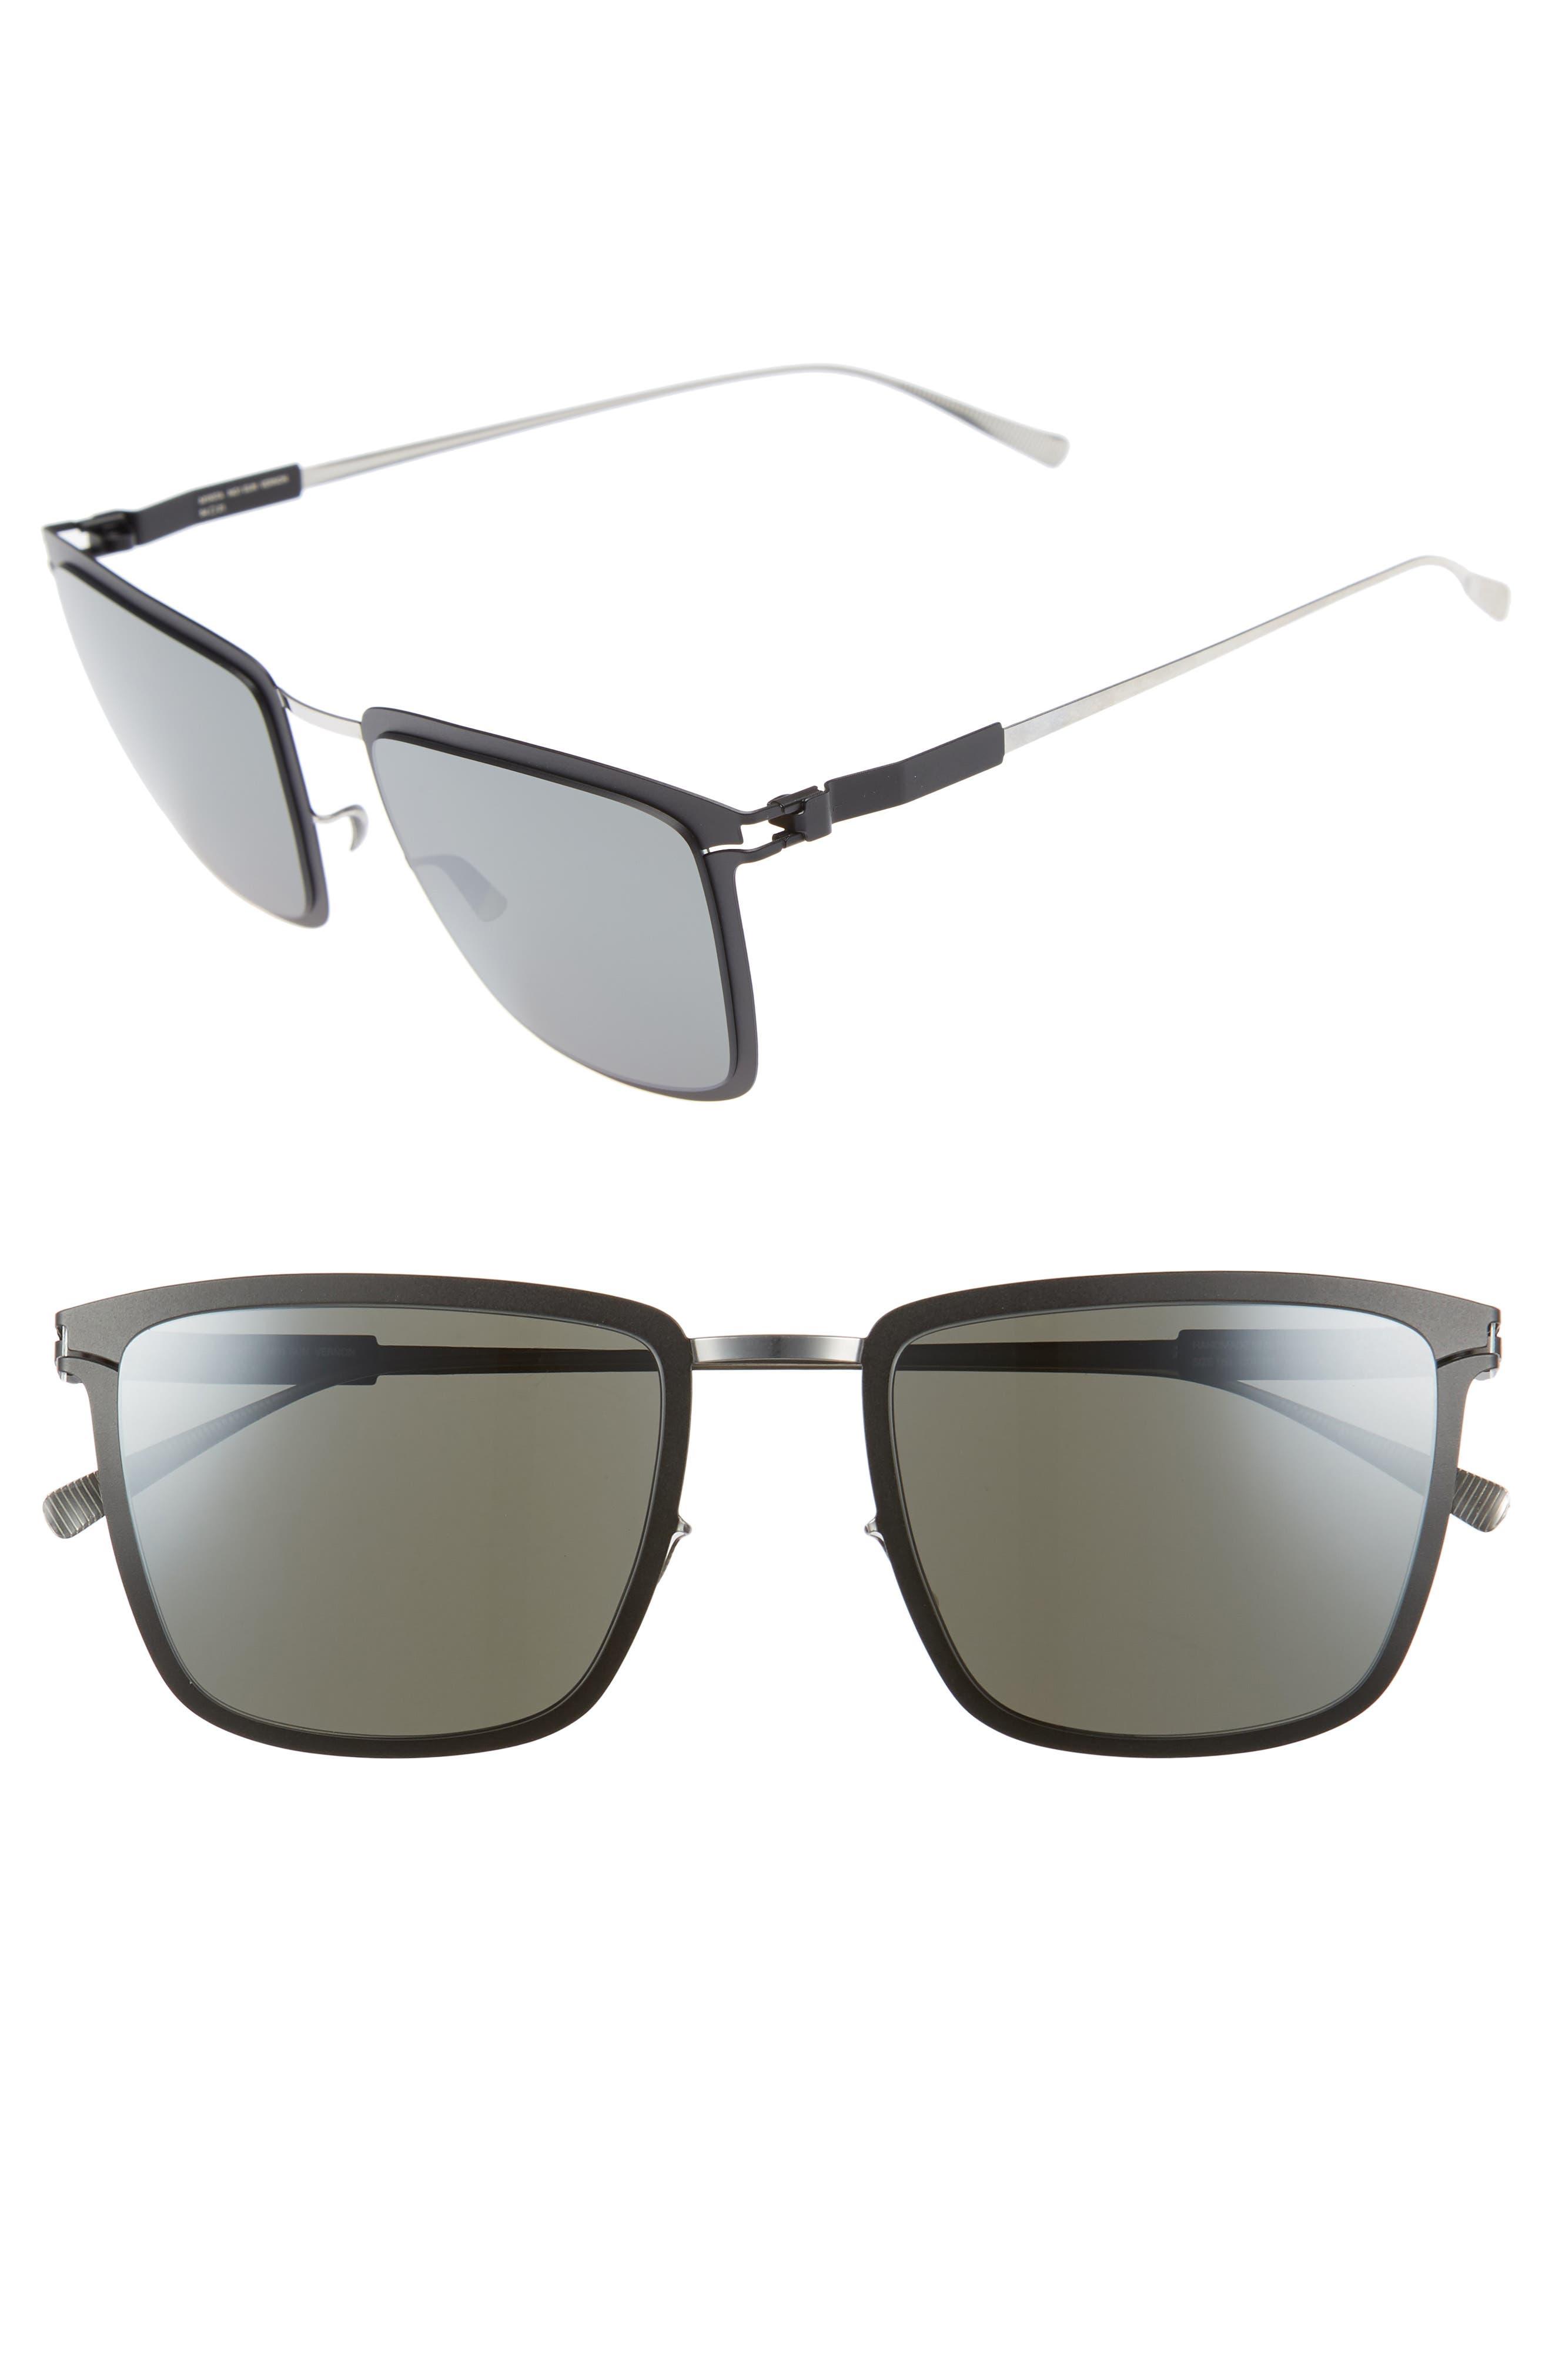 Vernon 54mm Mirrored Sunglasses,                             Main thumbnail 1, color,                             Silver/ Black